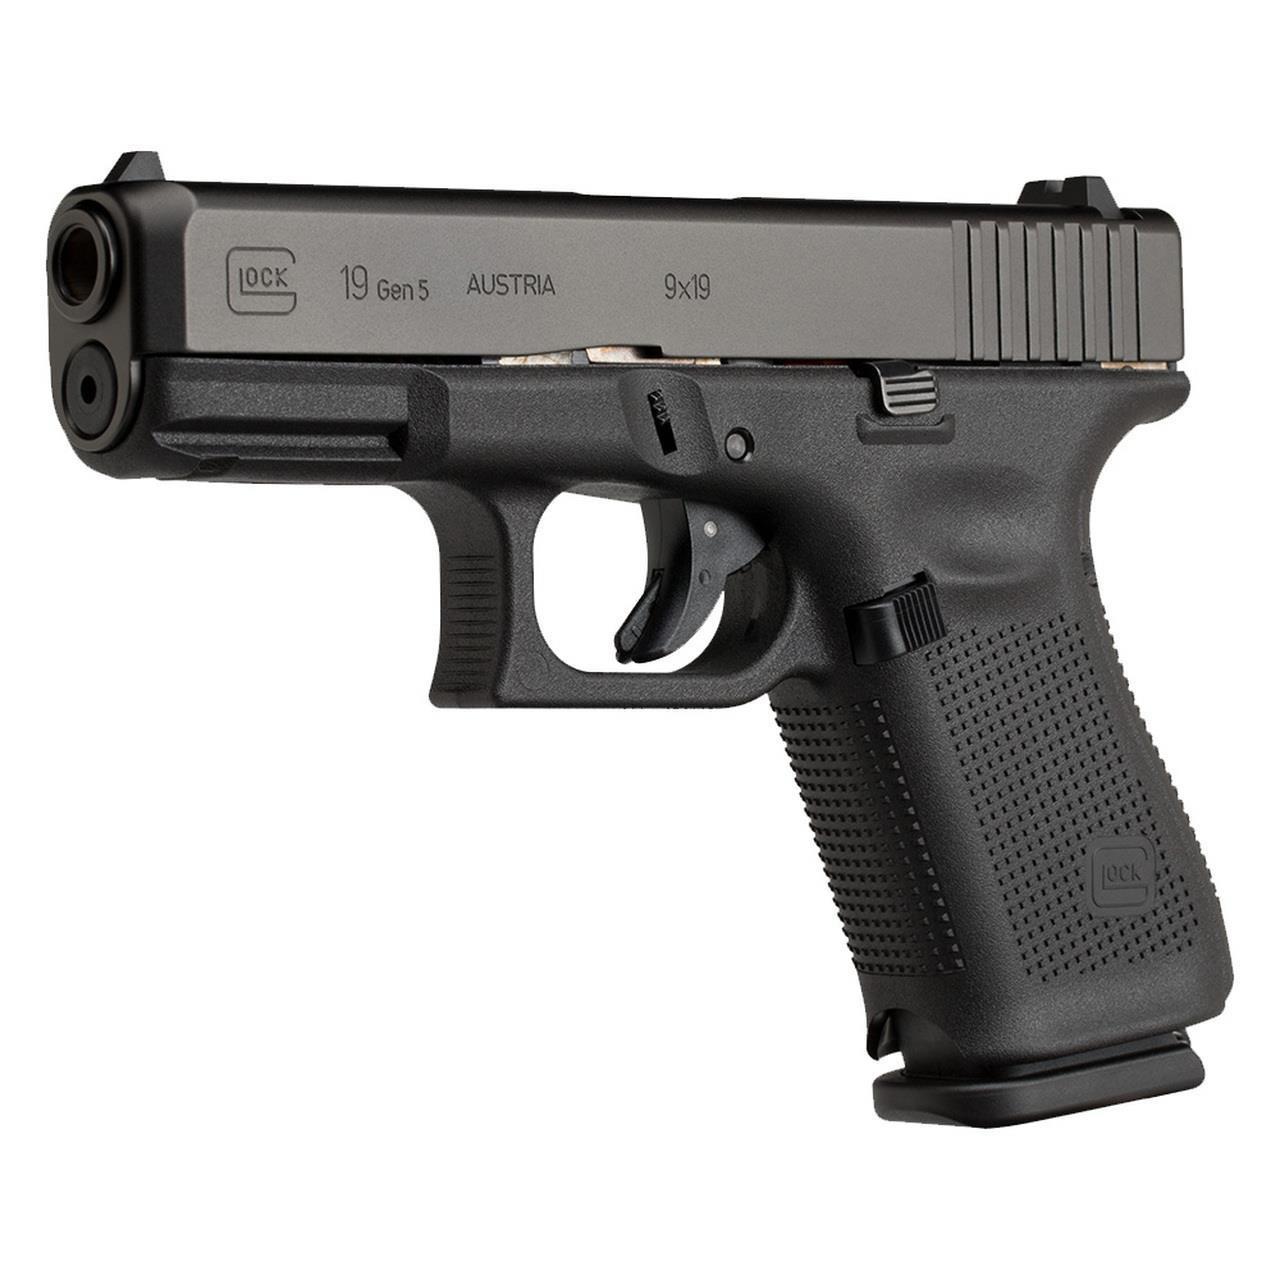 Glock PA195S202 19 Gen 5 Pistol 9mm 4in 15rd Handgun ...